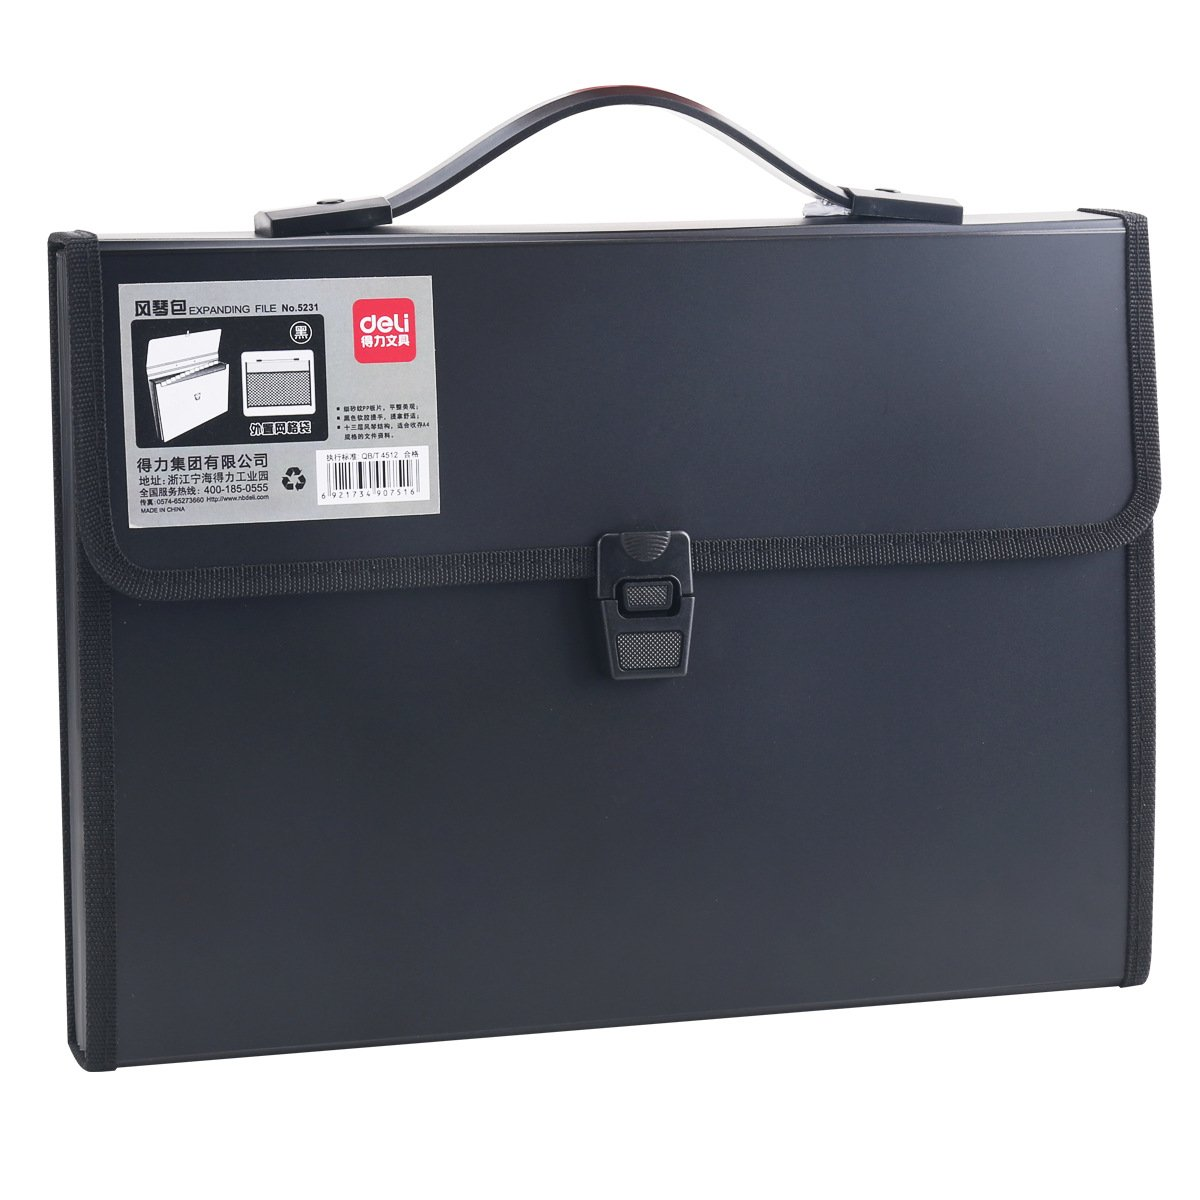 LI-GELISI Accordion Expanding File Folder,13-Pockets,A4 Size,Handle and Tabs,Buckle Closure (Black)